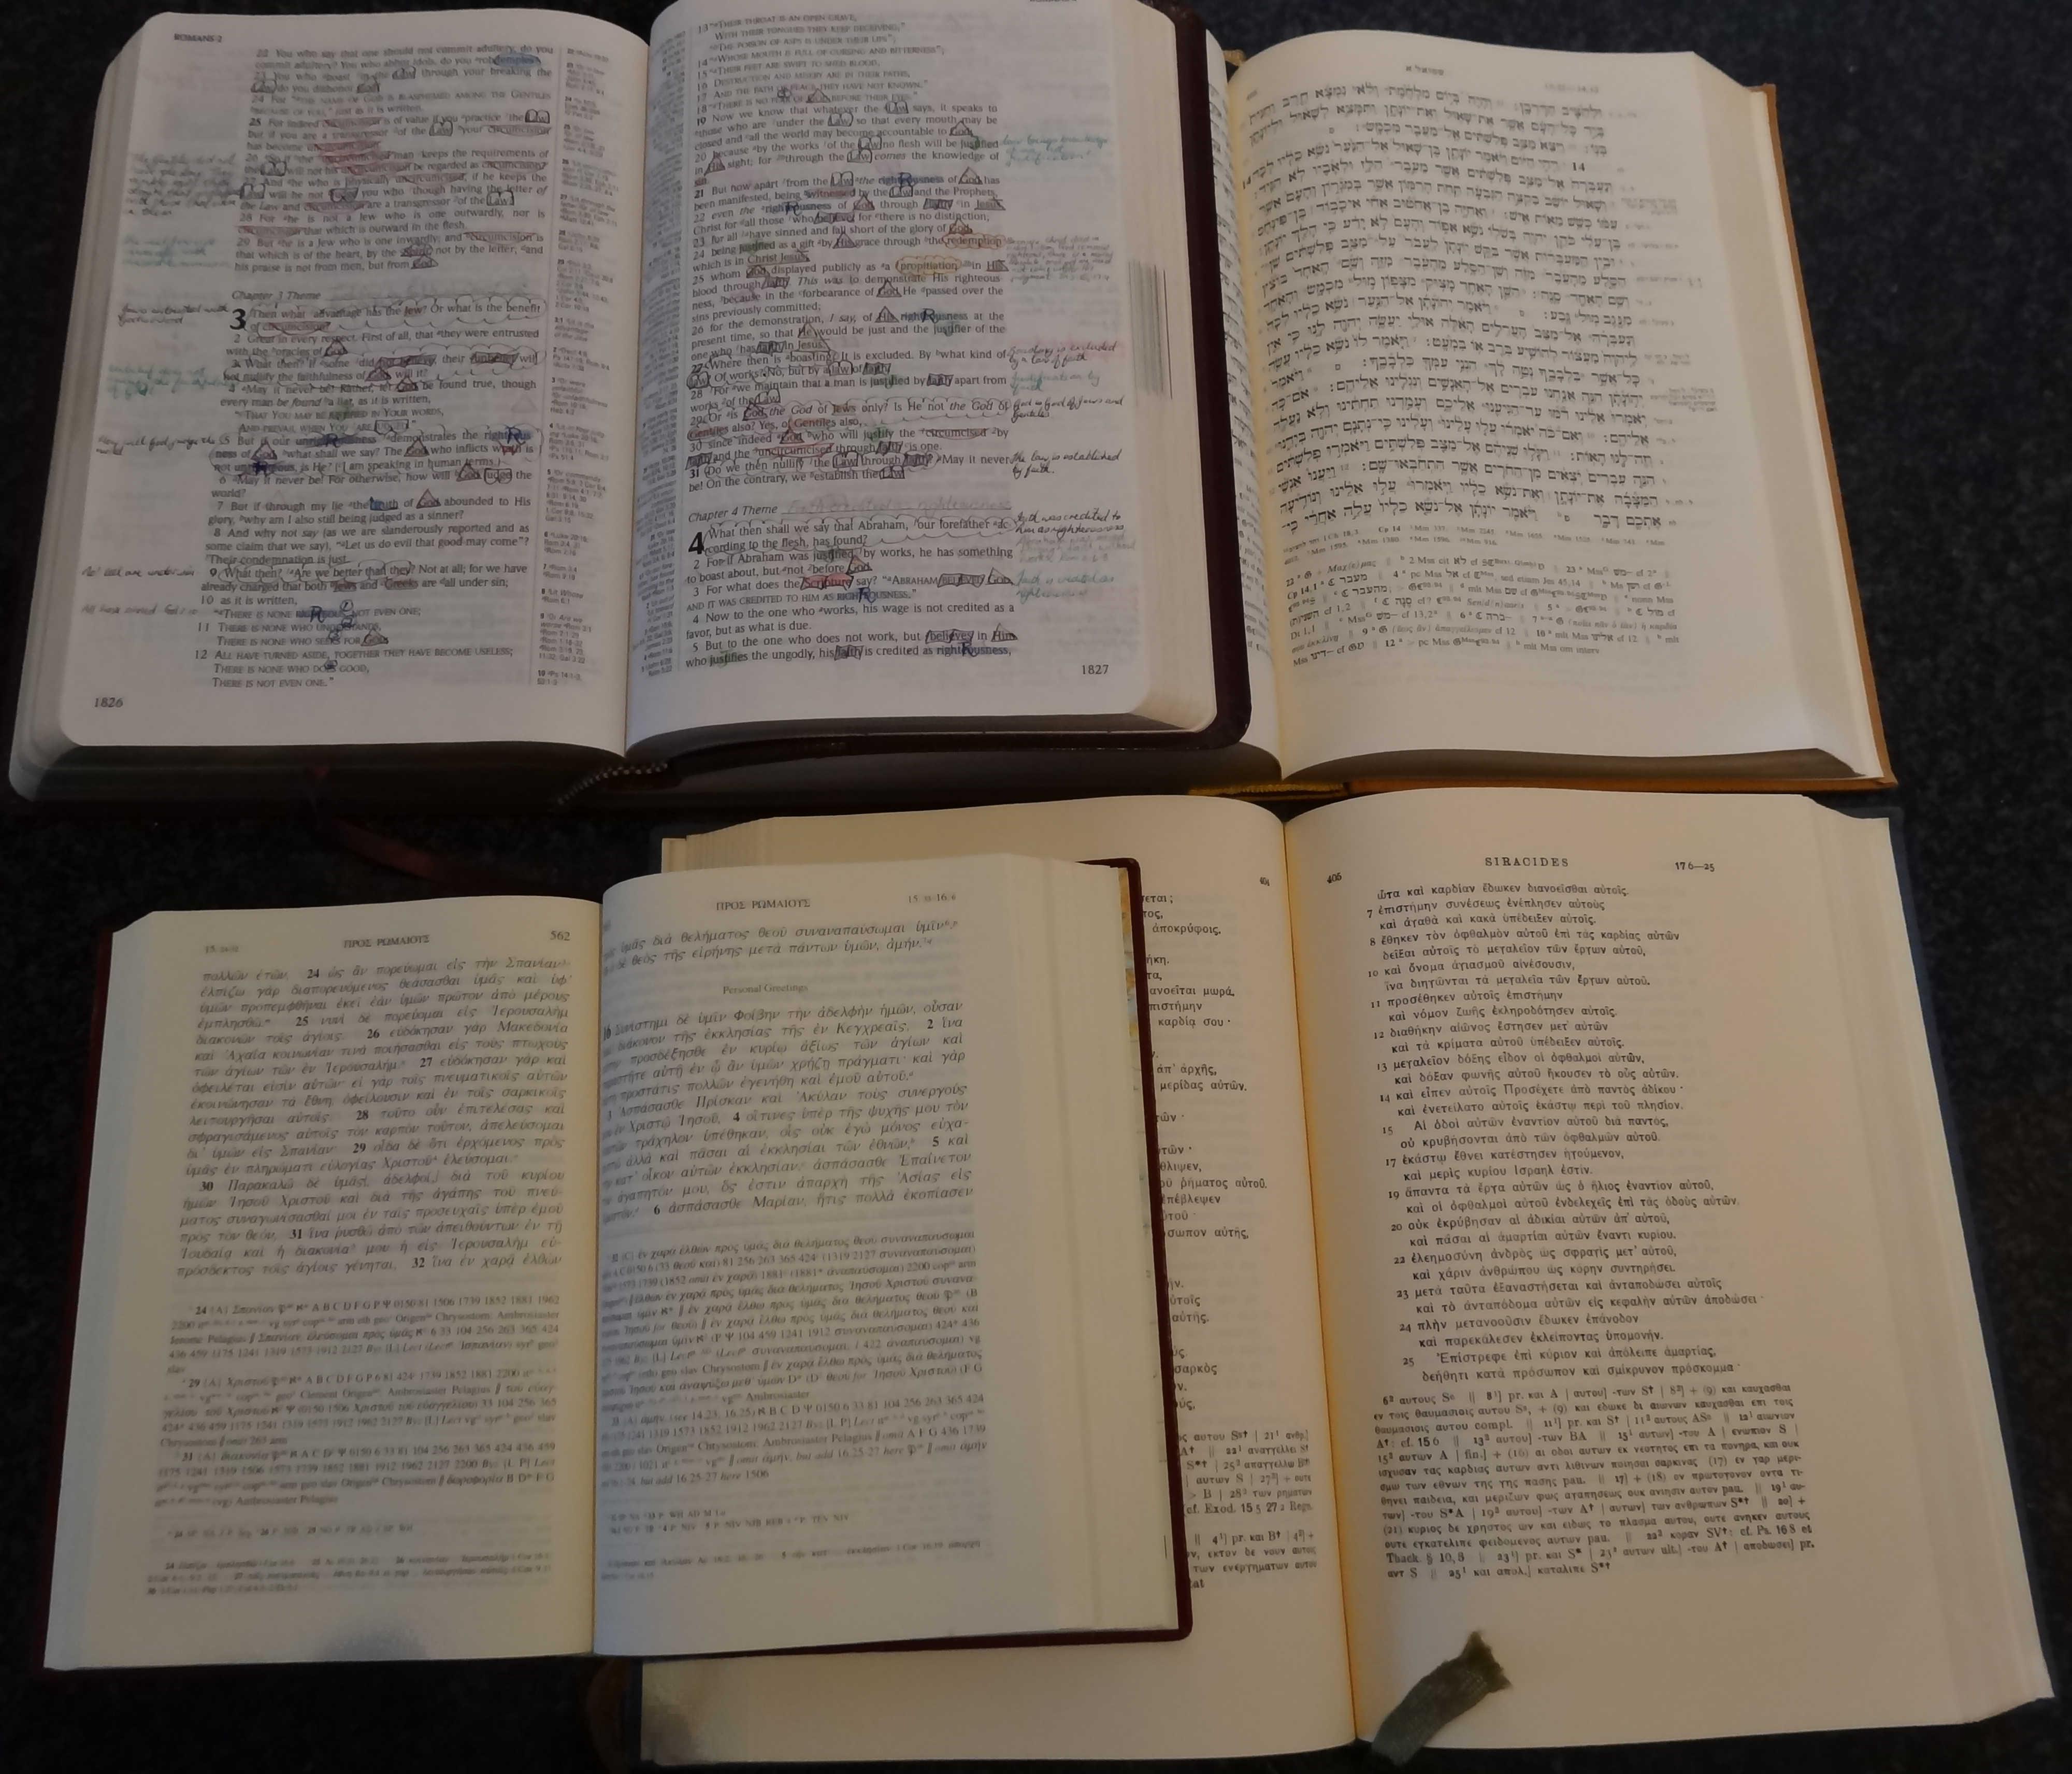 Vellum 2.5.1 kayprisa bible